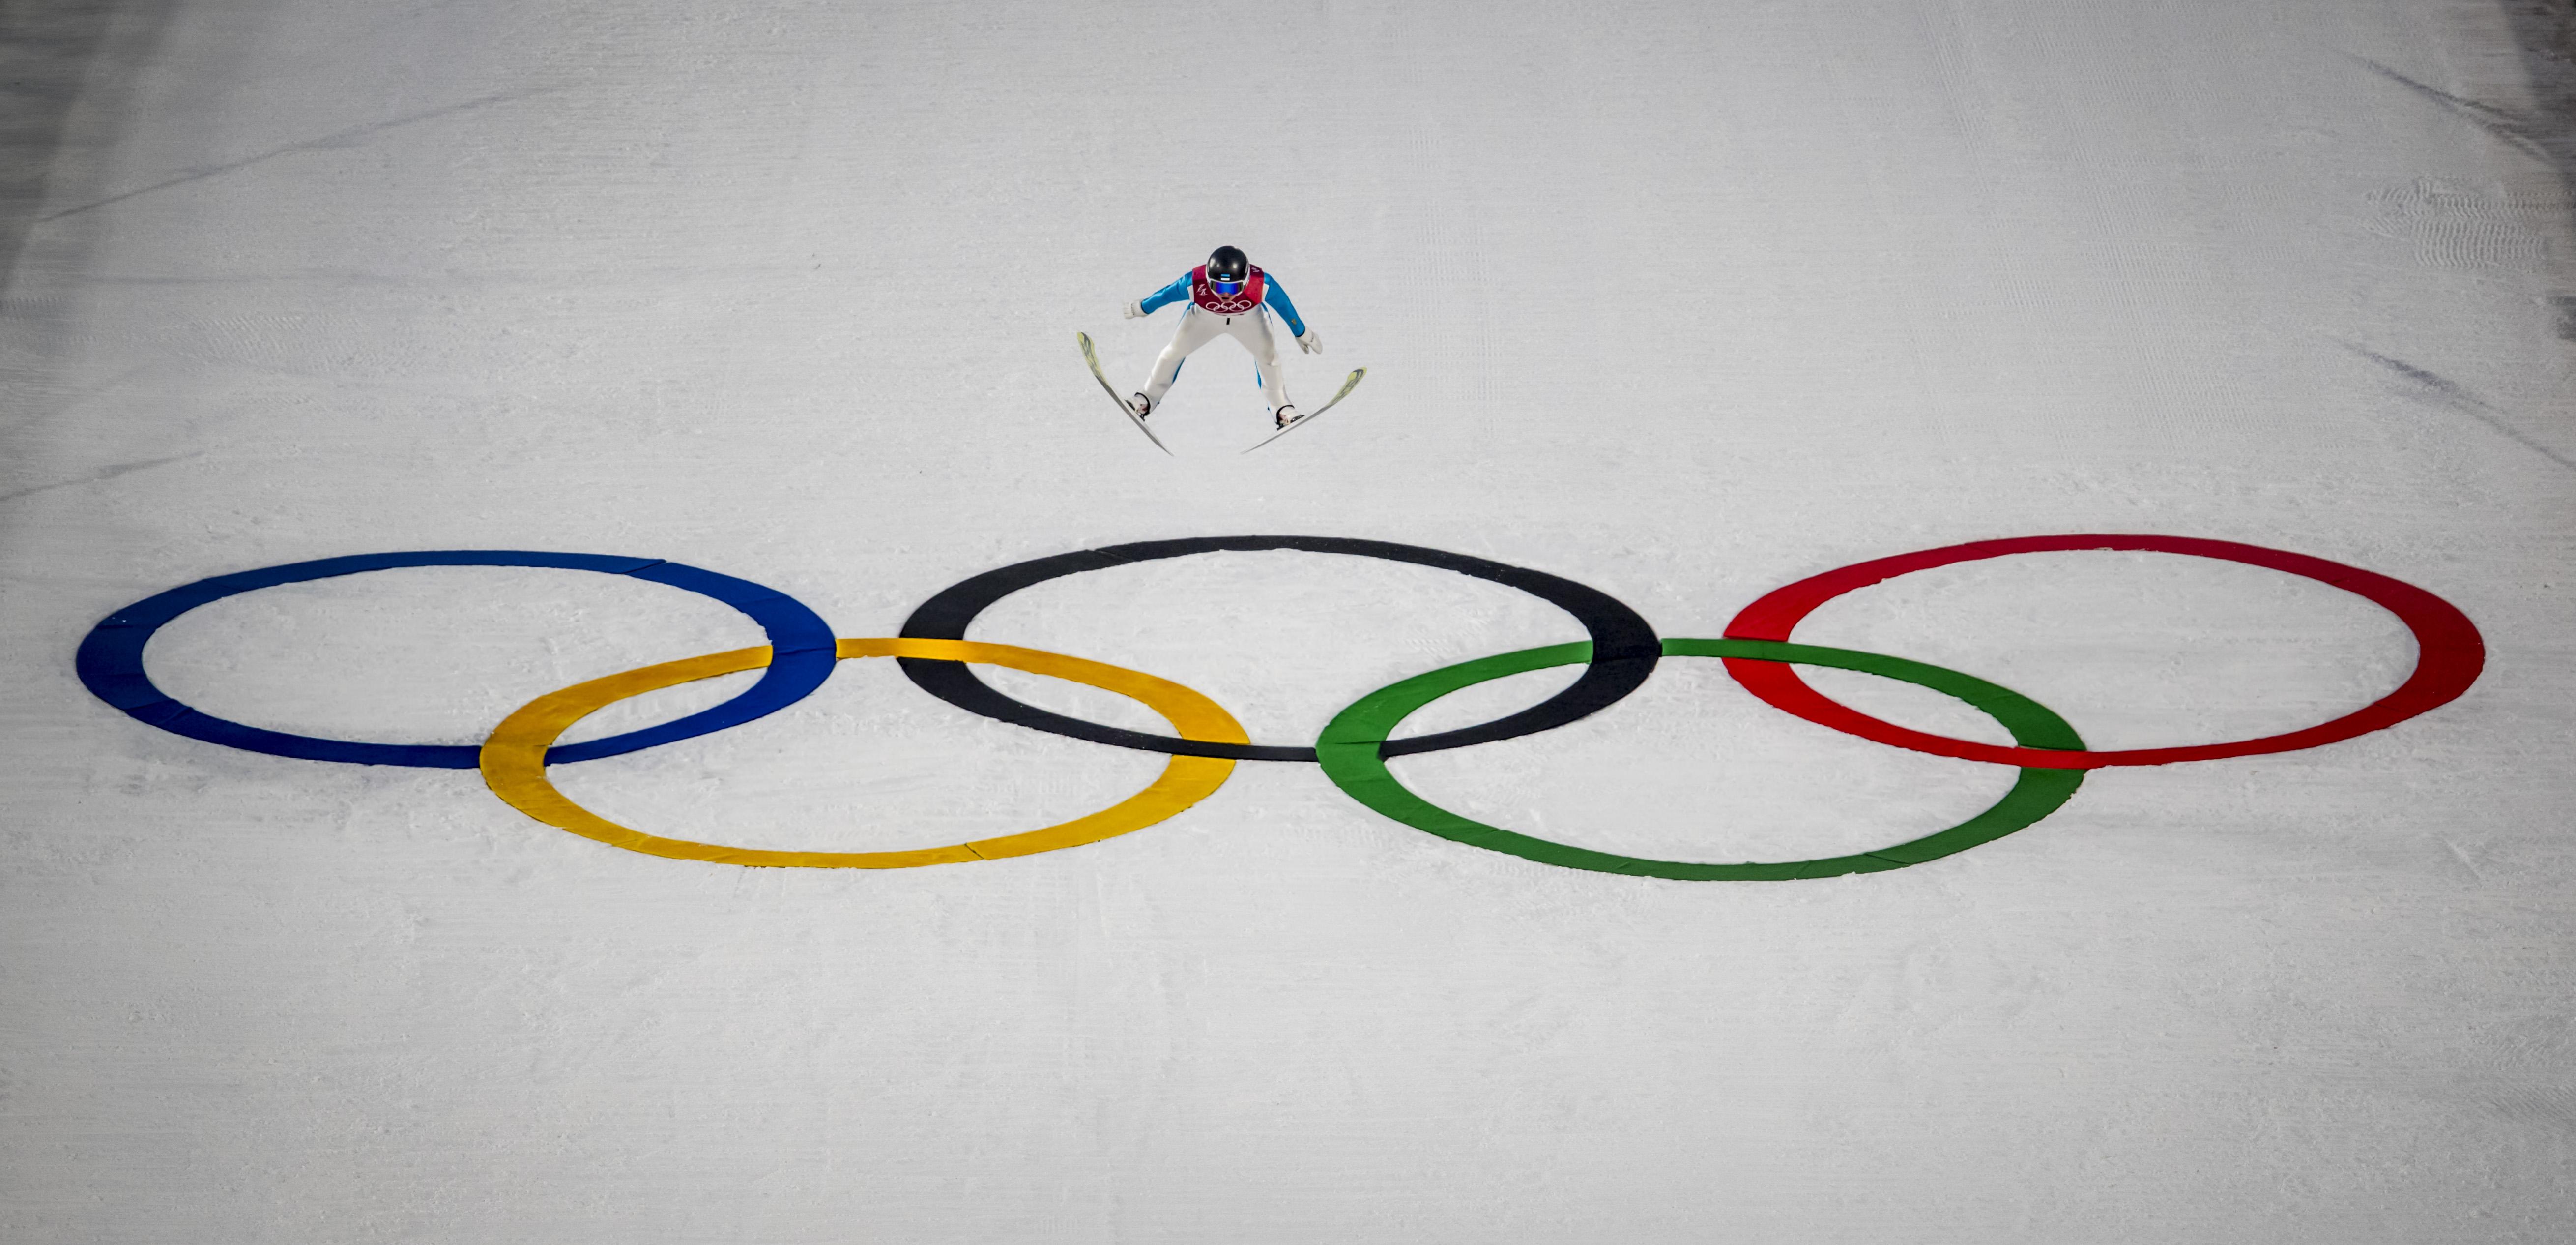 20180220_PyeongChang2018_001